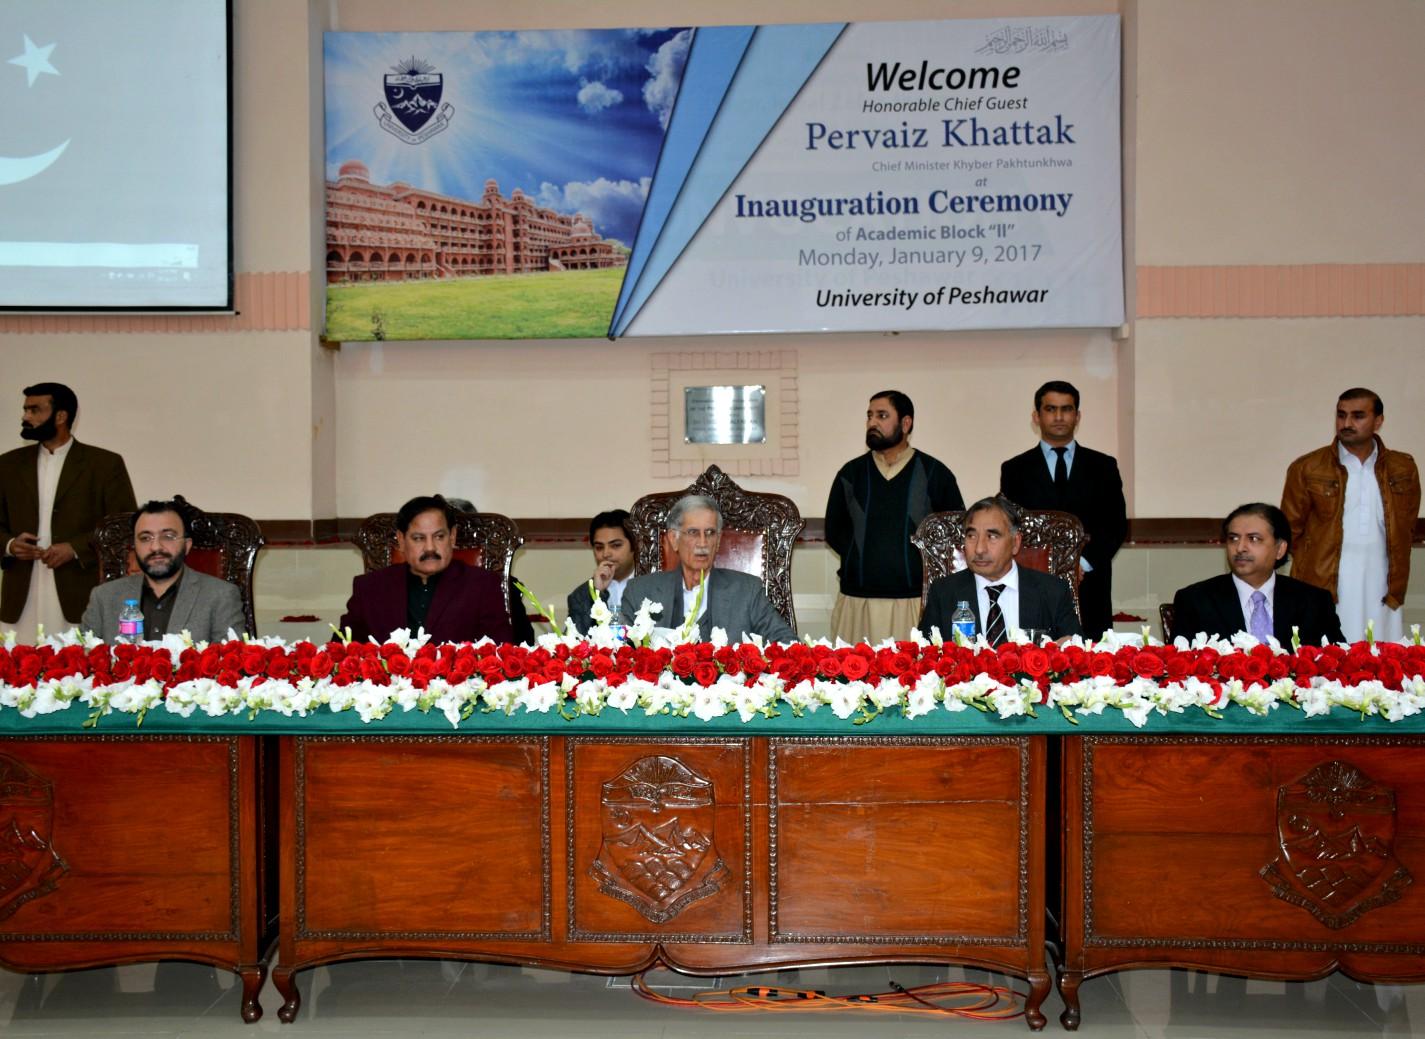 Chief Minister Khyber Pukhtunkhwa Mr. Pervez Khatak visit to UoP